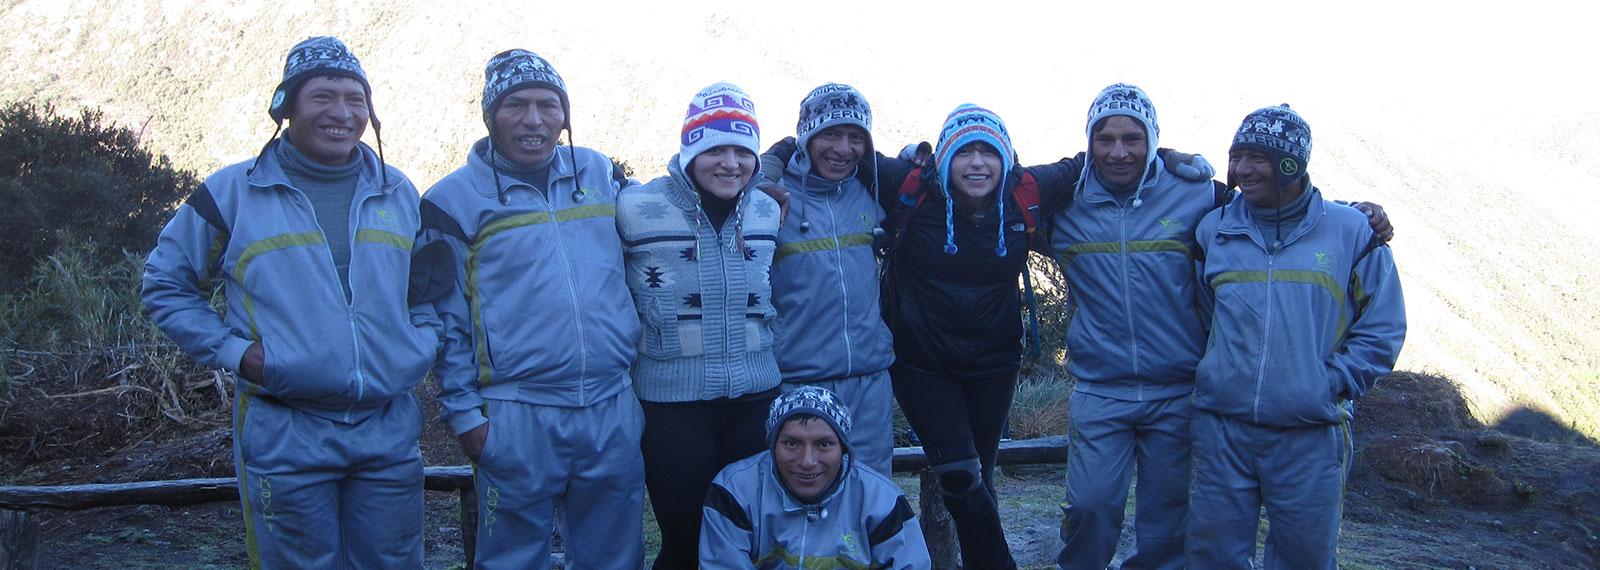 kaypi team to inka trail